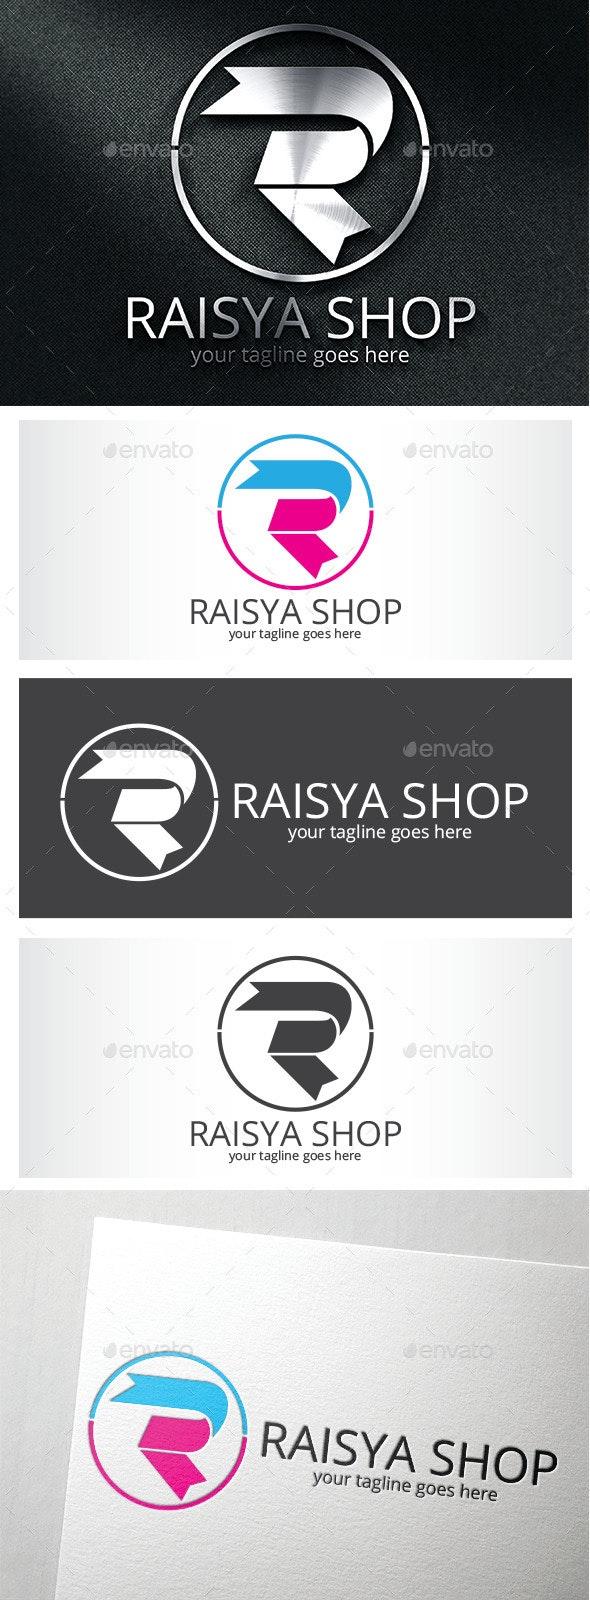 Raisya Shop Logo / Letter R Logo - Letters Logo Templates